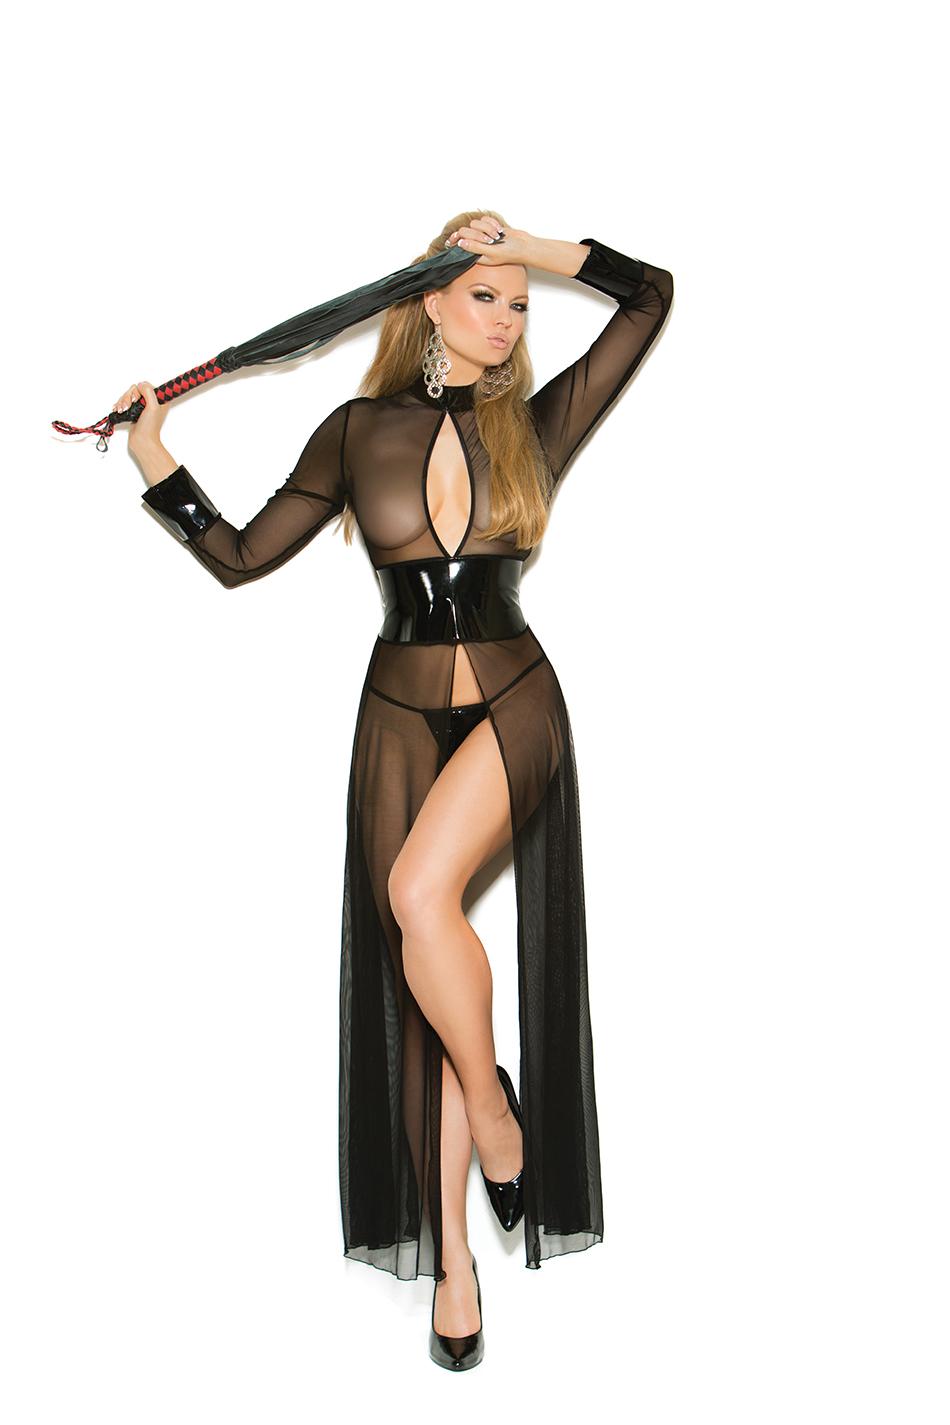 erotic photo lakk klær